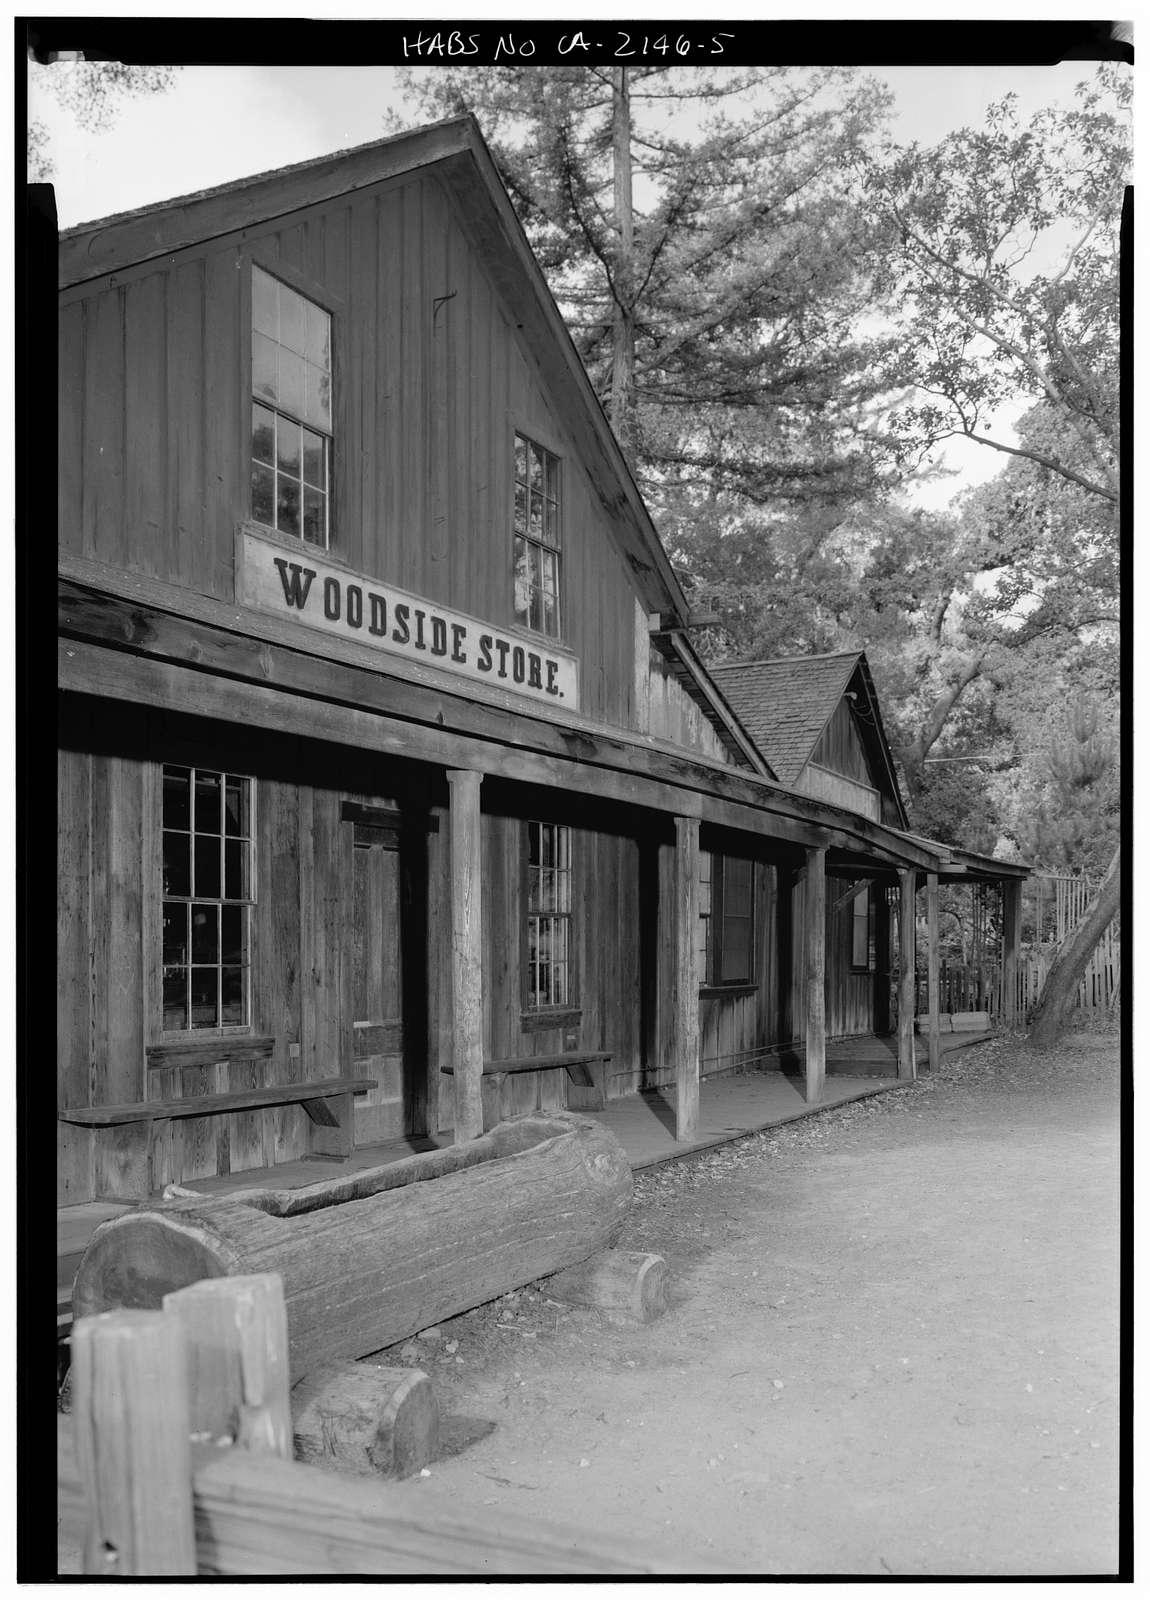 Woodside Store, Kings Mountain Road, Woodside, San Mateo County, CA